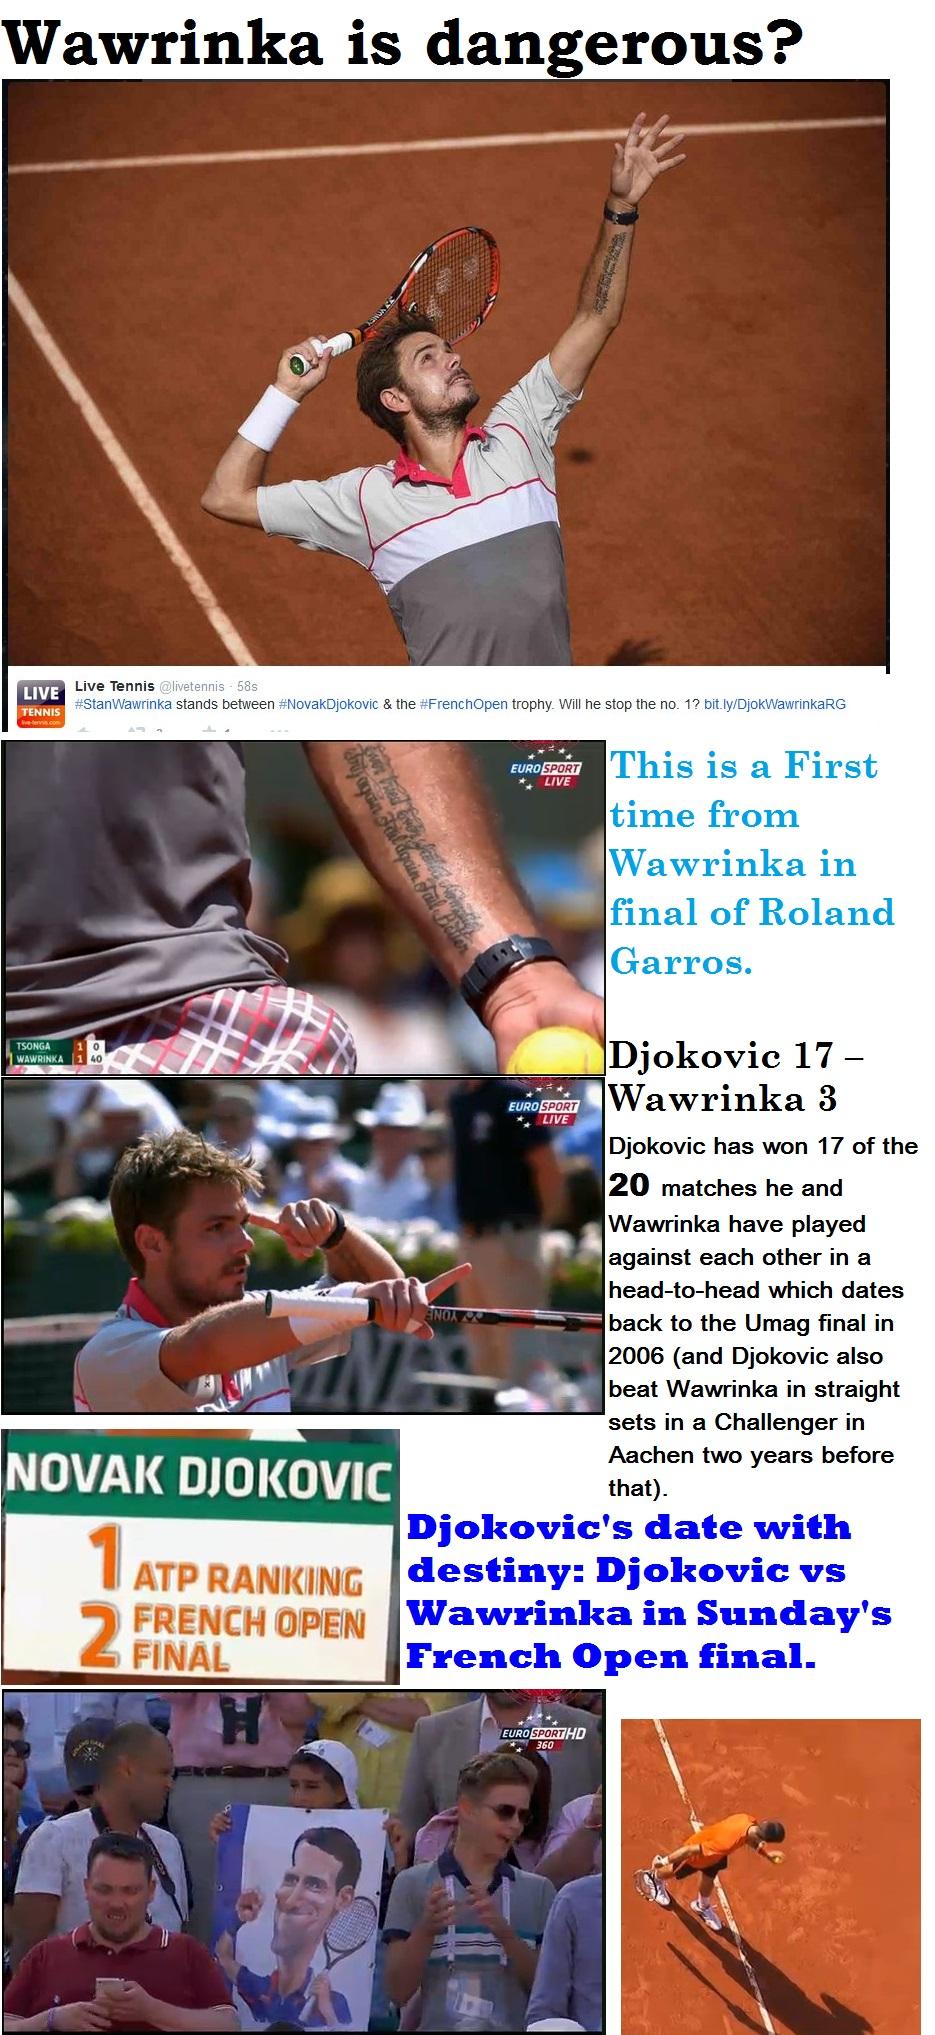 TENNIS GRAND SLAM DJOKOVIC VS WAWRINKA FINAL 01 070615